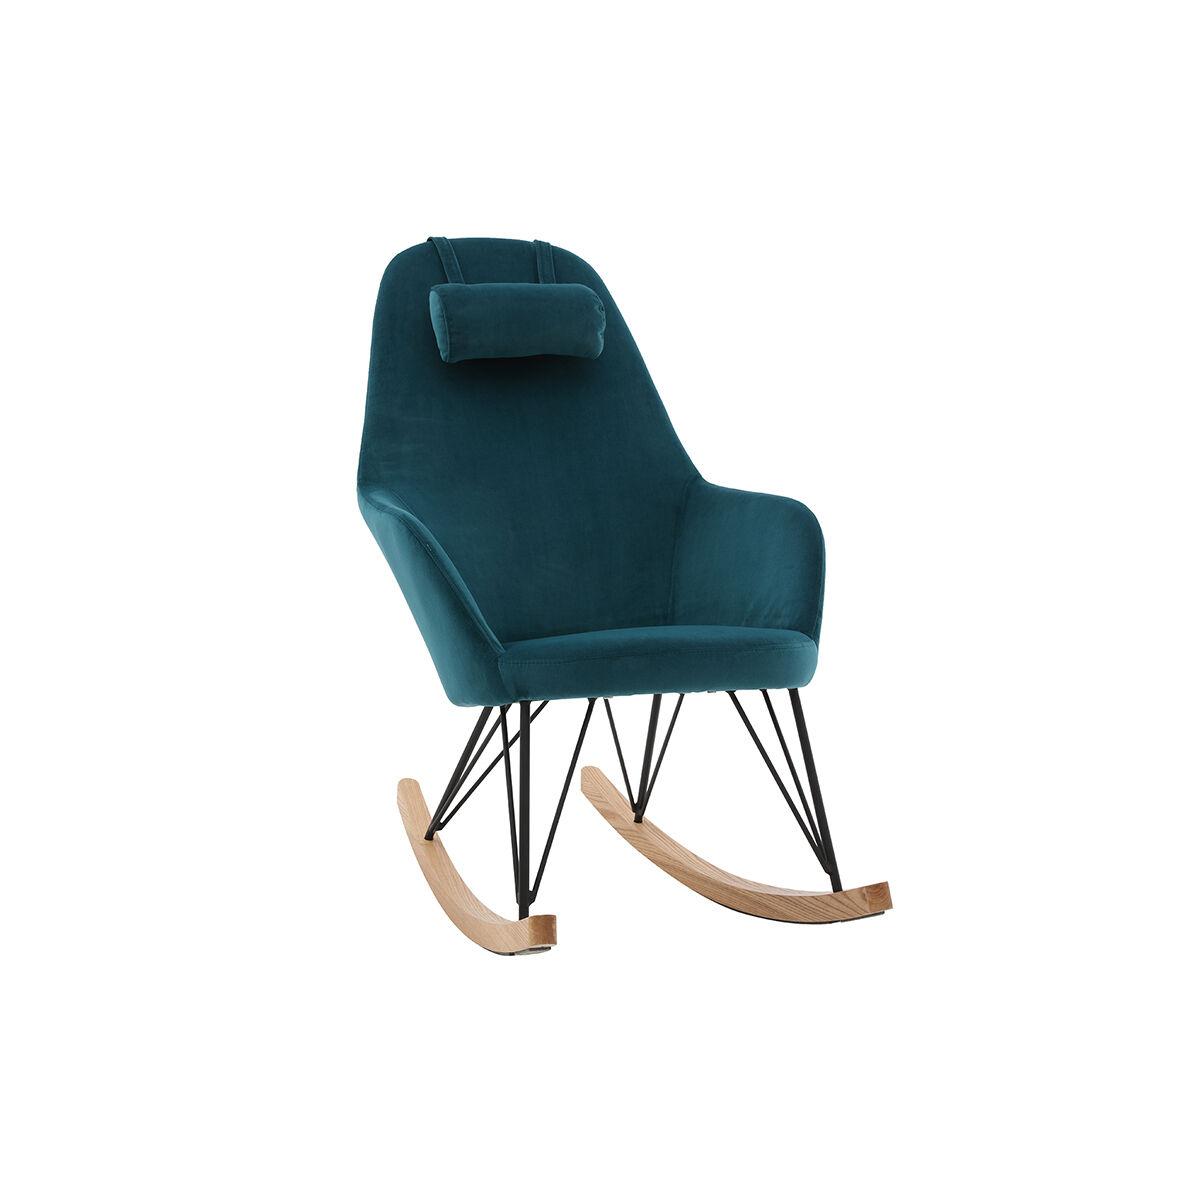 Miliboo Rocking chair scandinave en velours bleu pétrole JHENE